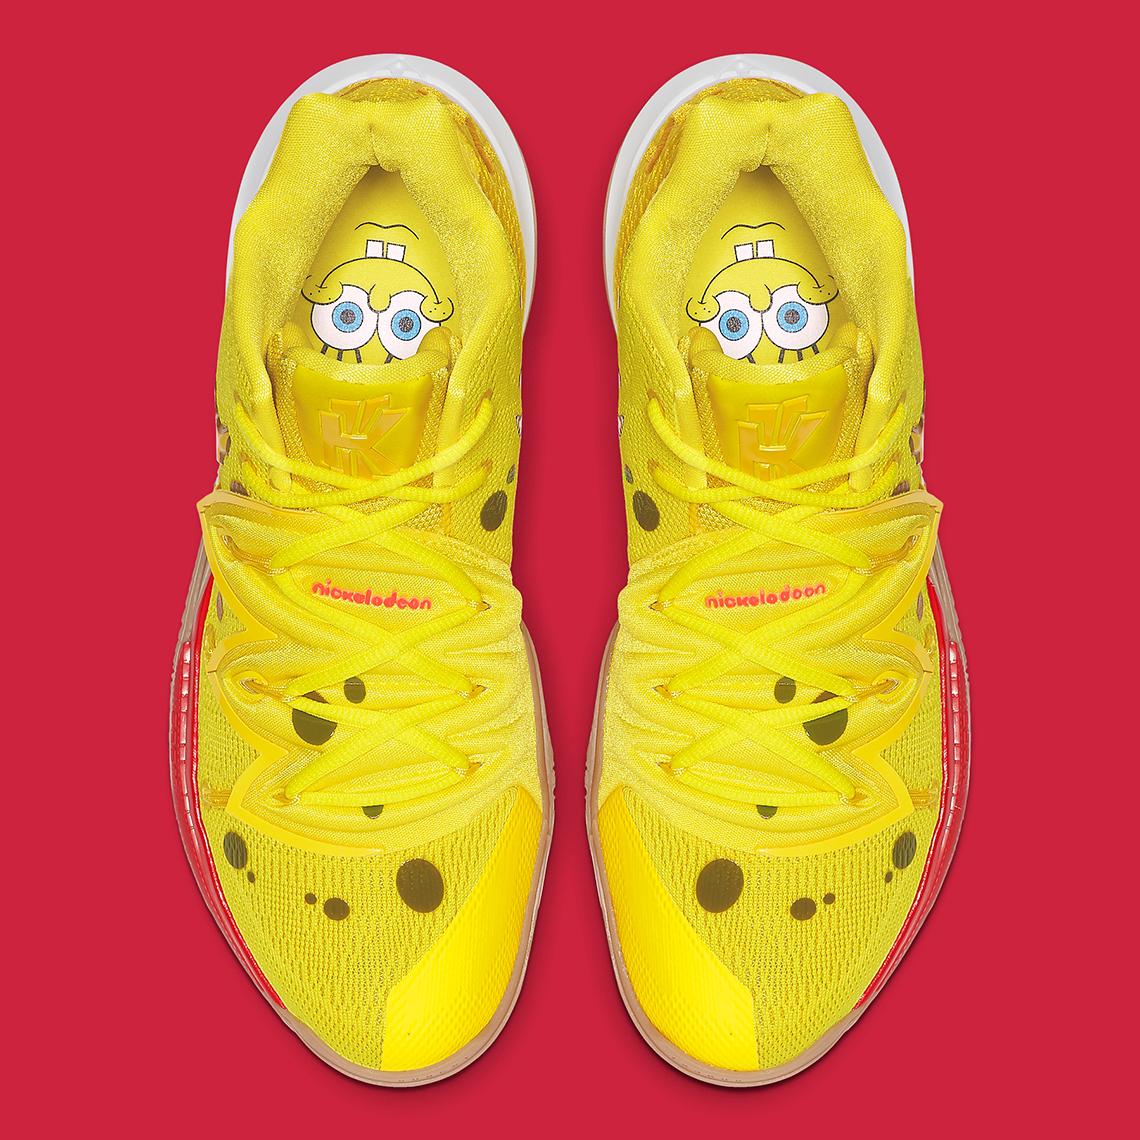 SpongeBob Nike Kyrie 5 Shoes - Release Date | SneakerNews.com